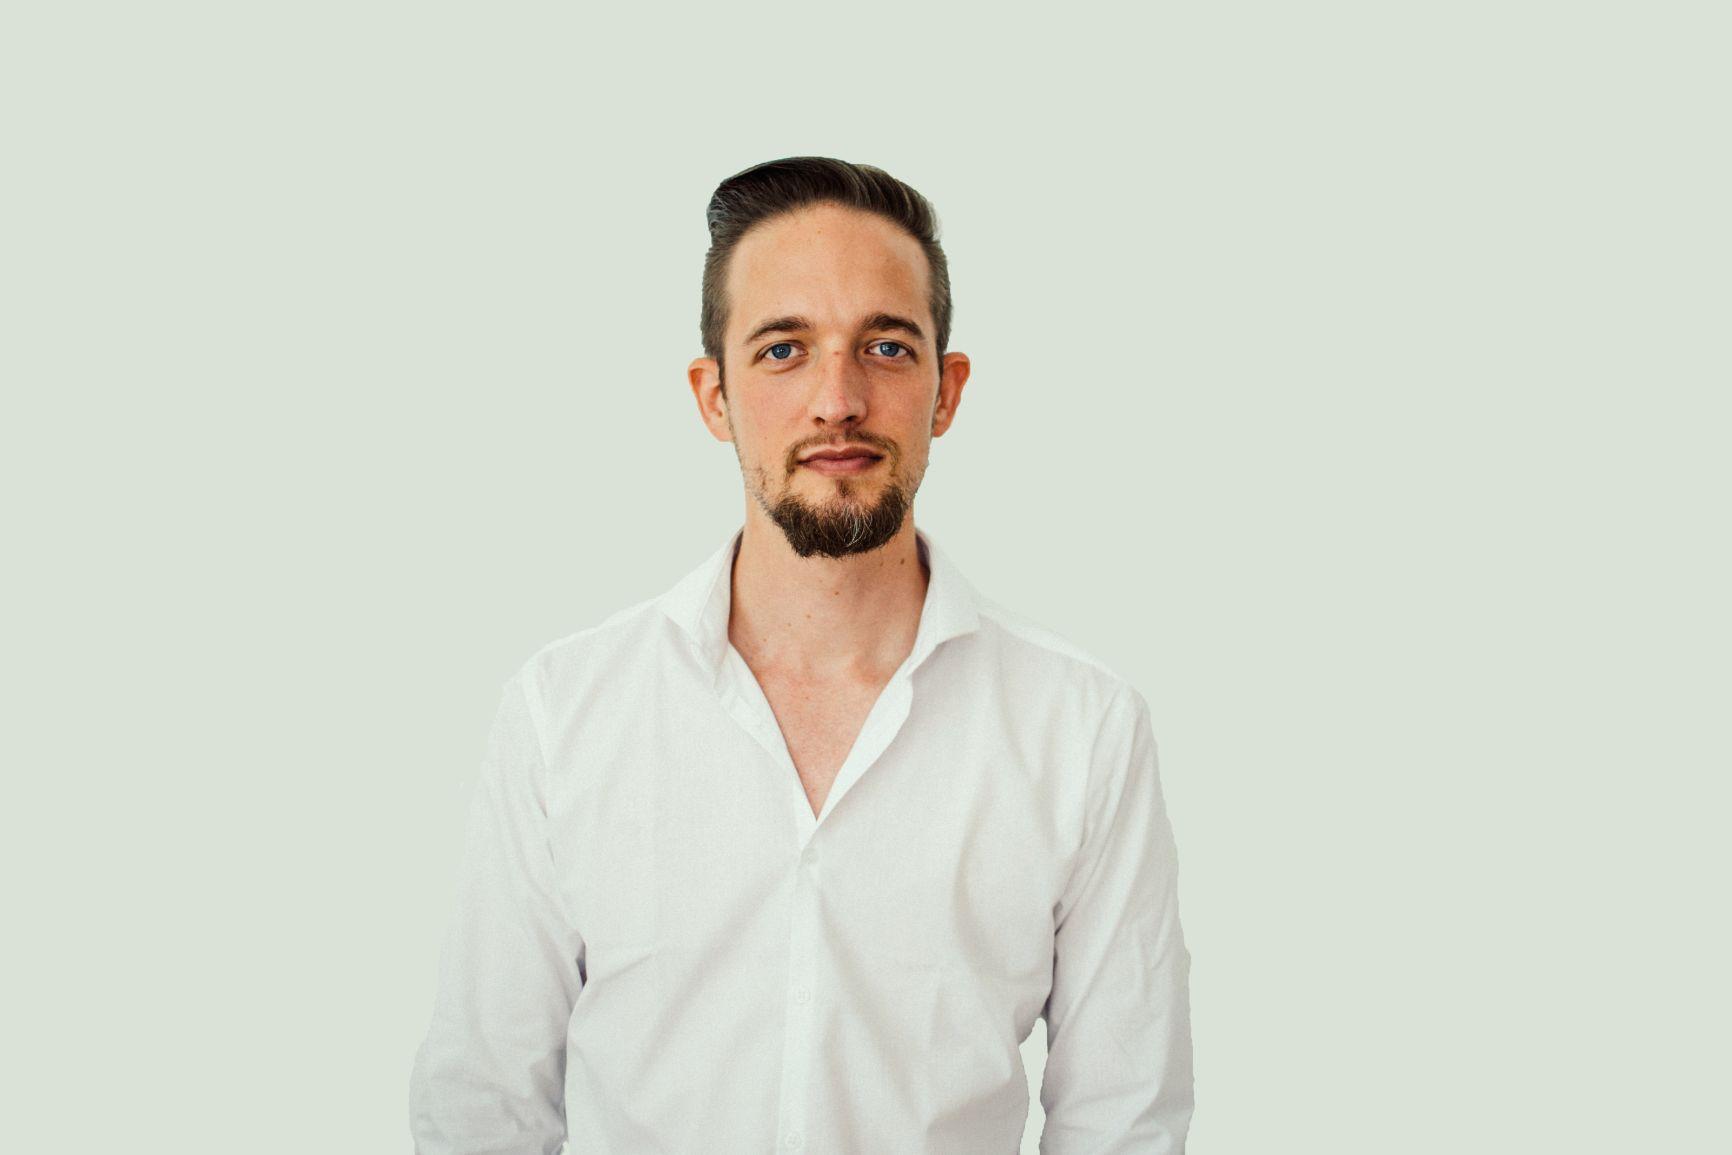 Dr. Christoph Berdenich, BSc